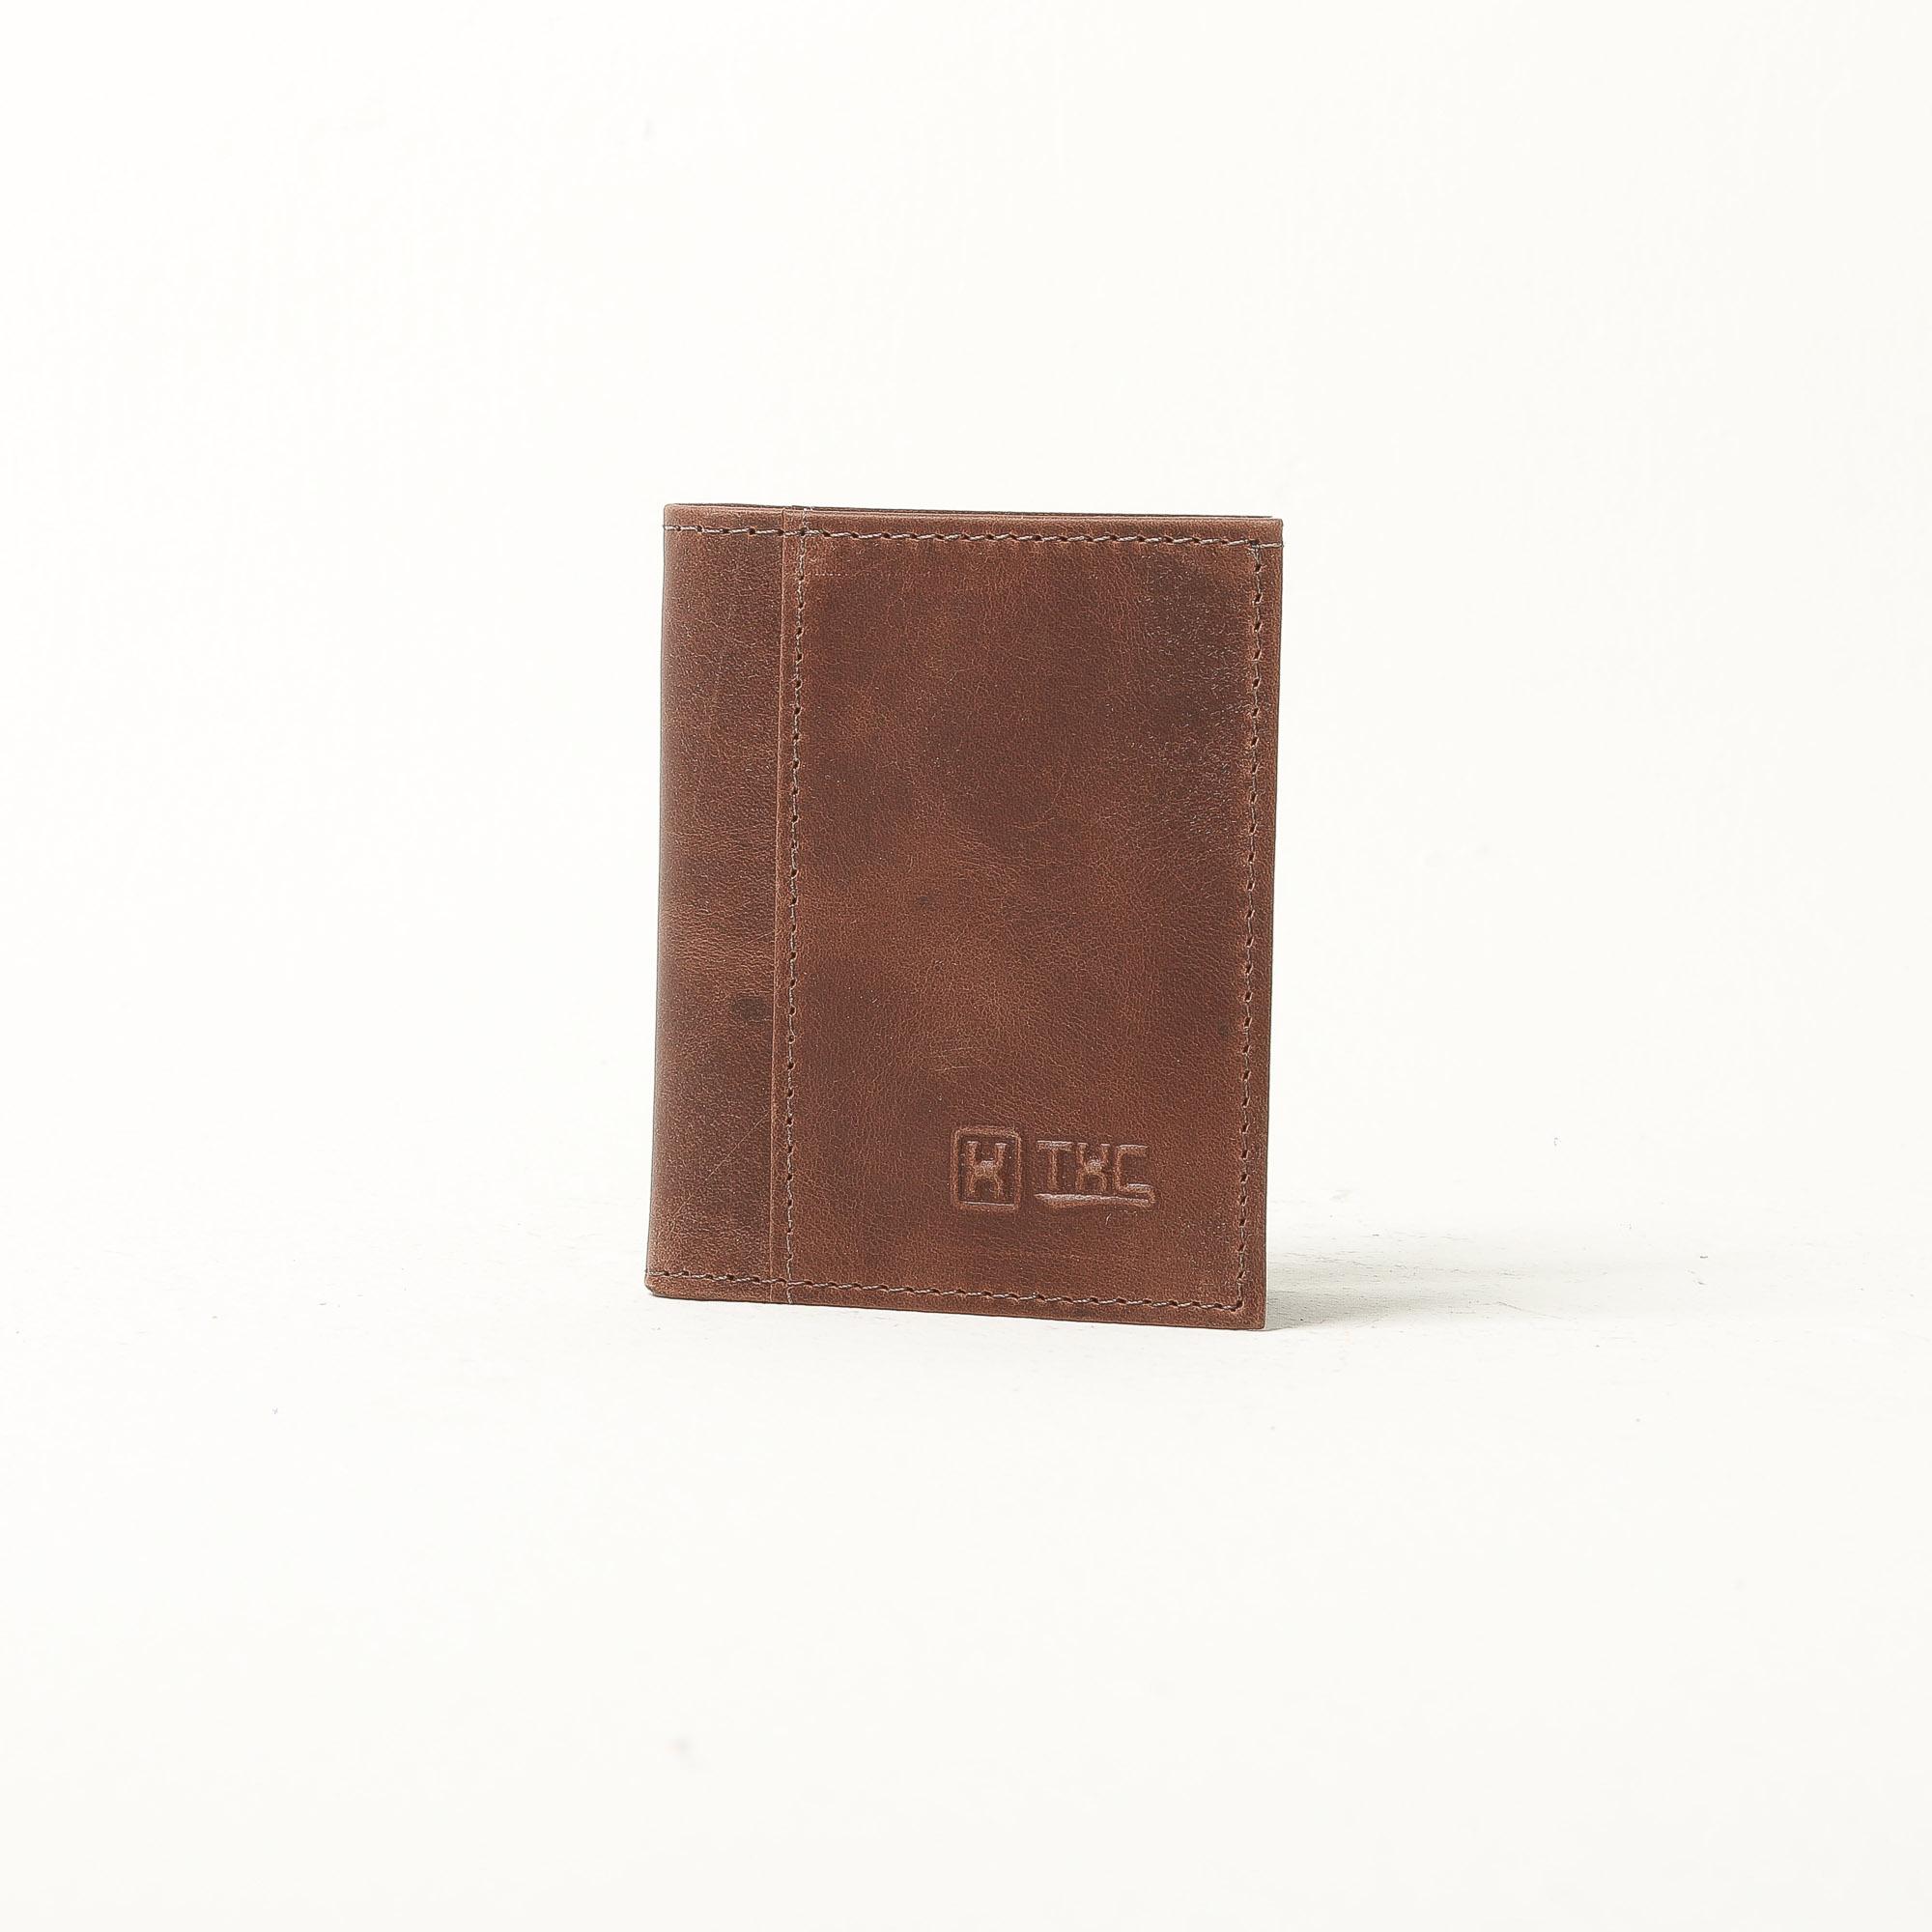 Carteira TXC 11029